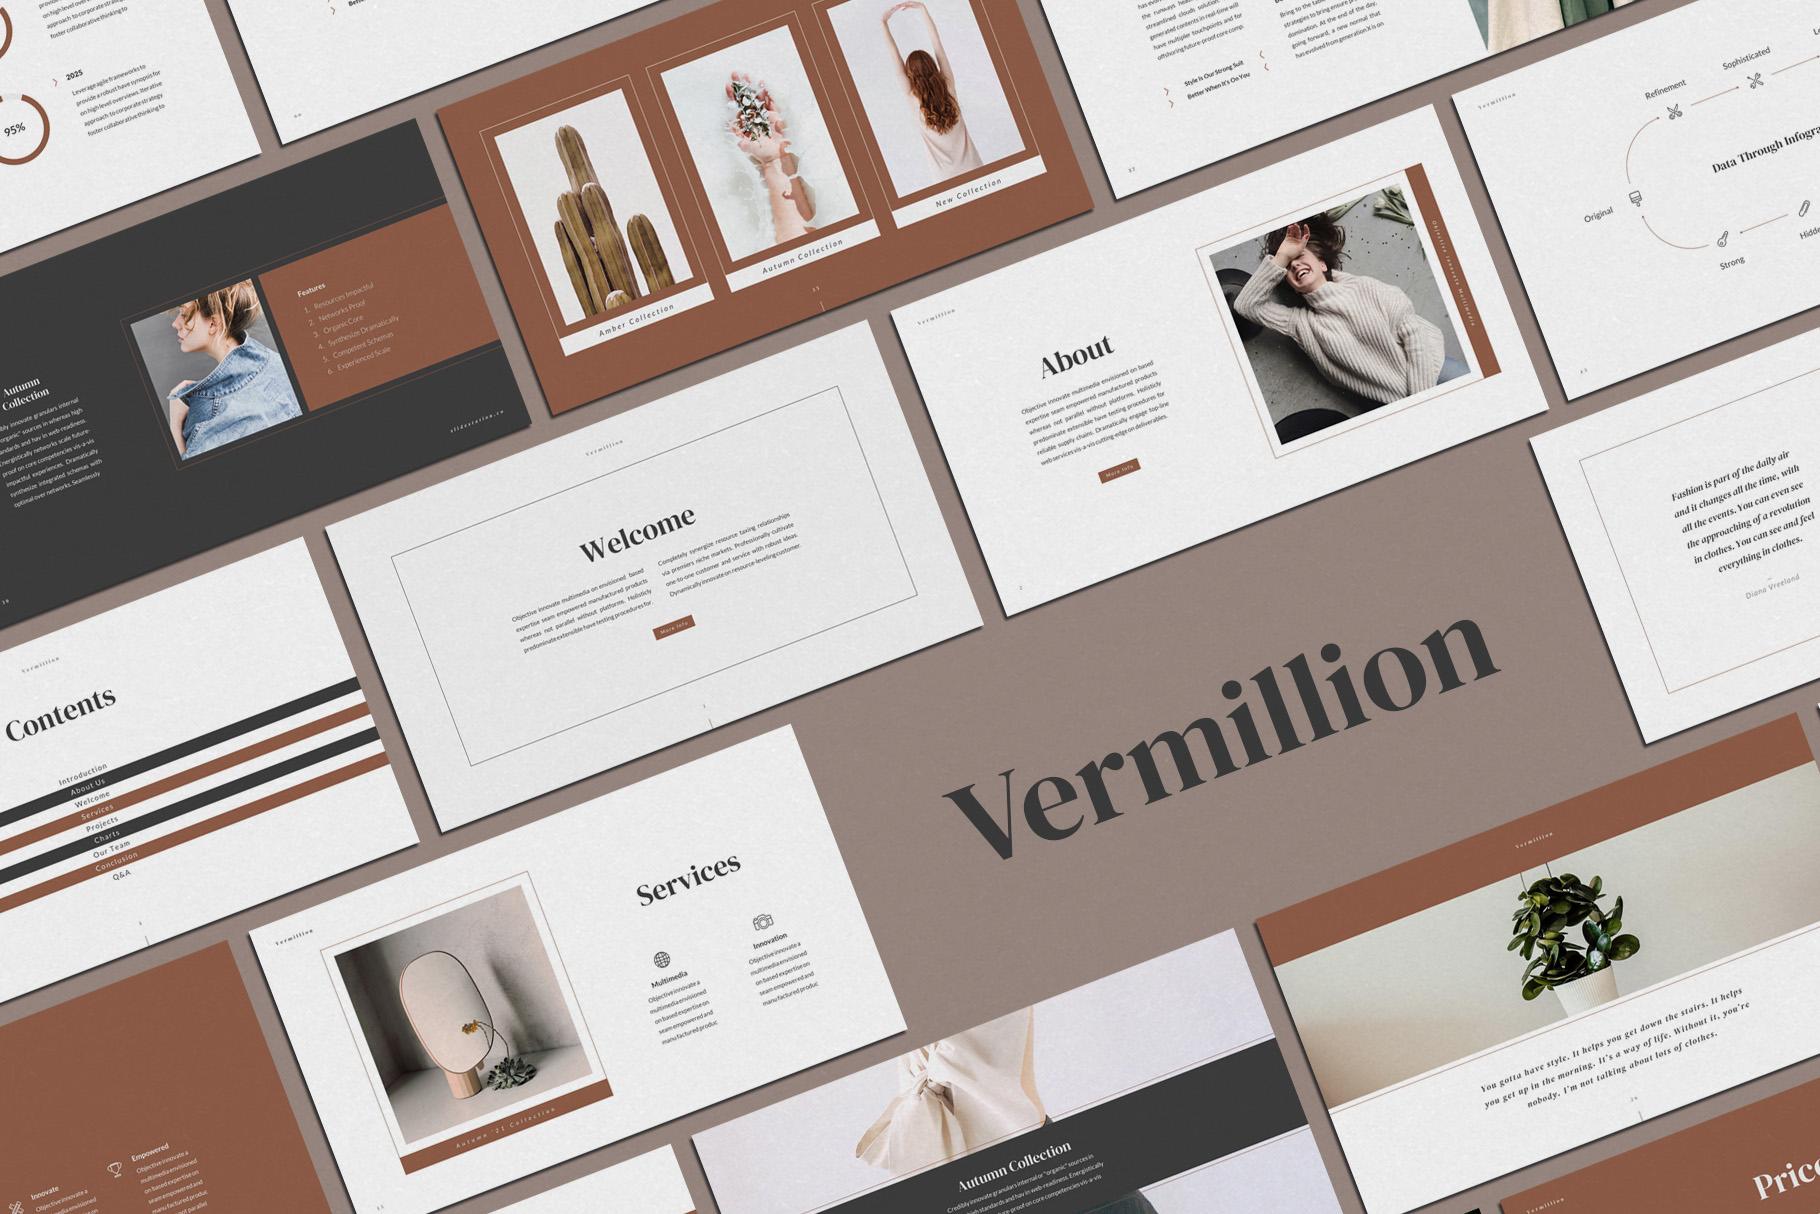 Vermillion PowerPoint Presentation Template example image 2